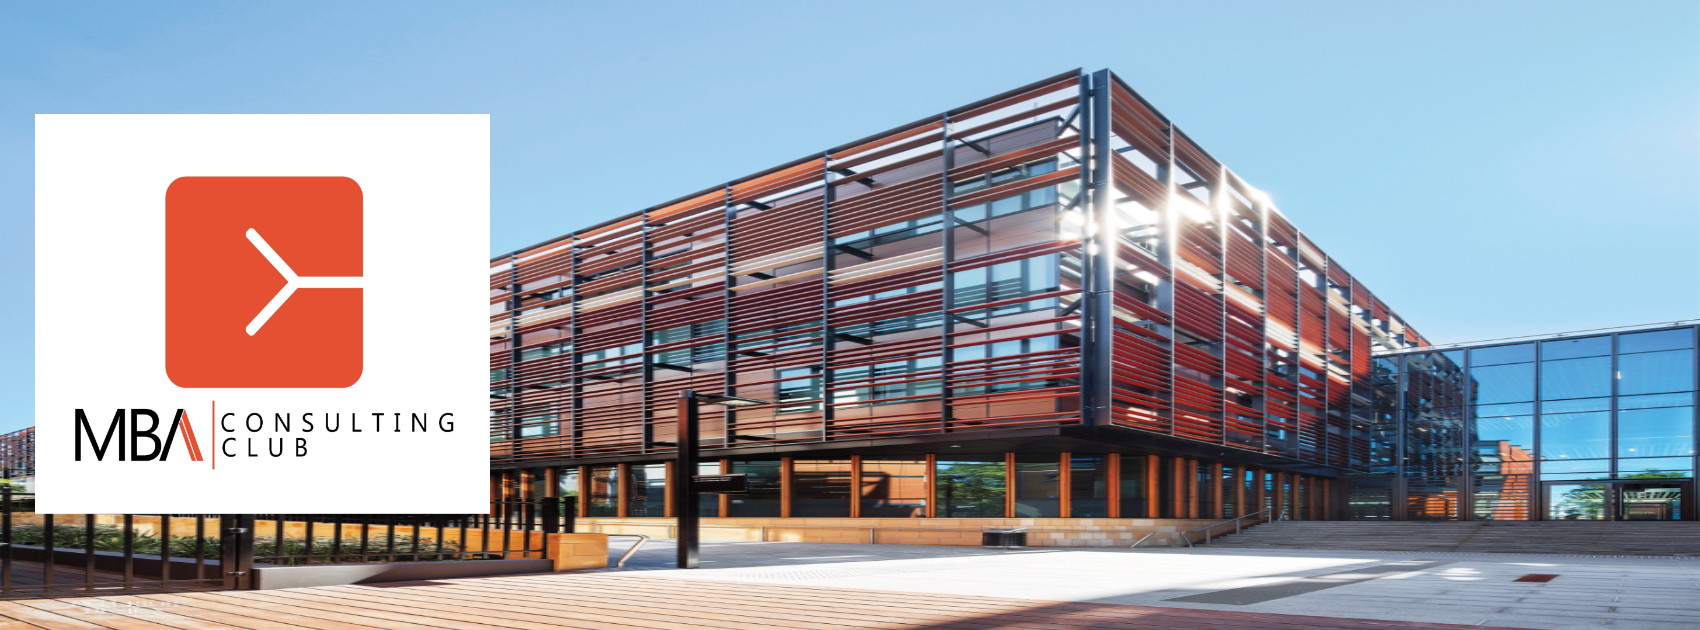 University Of Sydney MBA Consulting Club